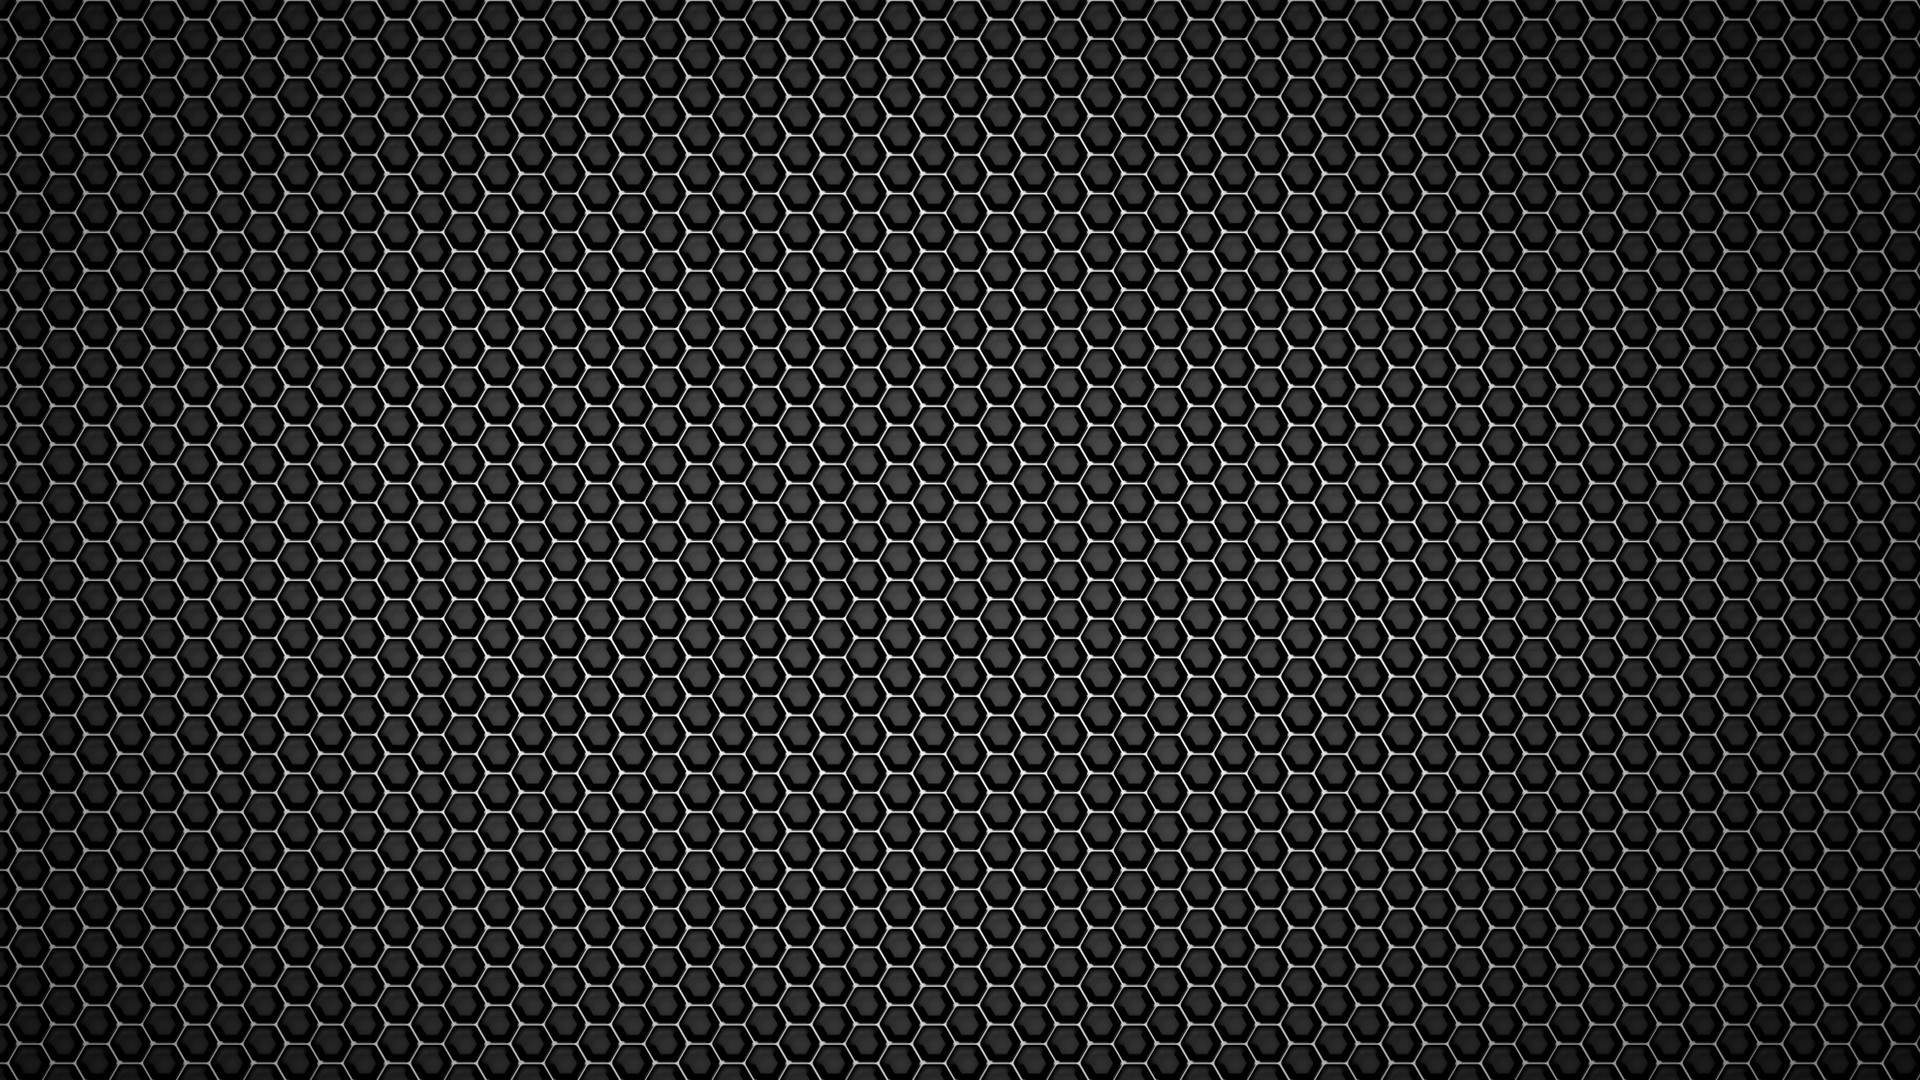 Black Metal Wallpaper Jpg